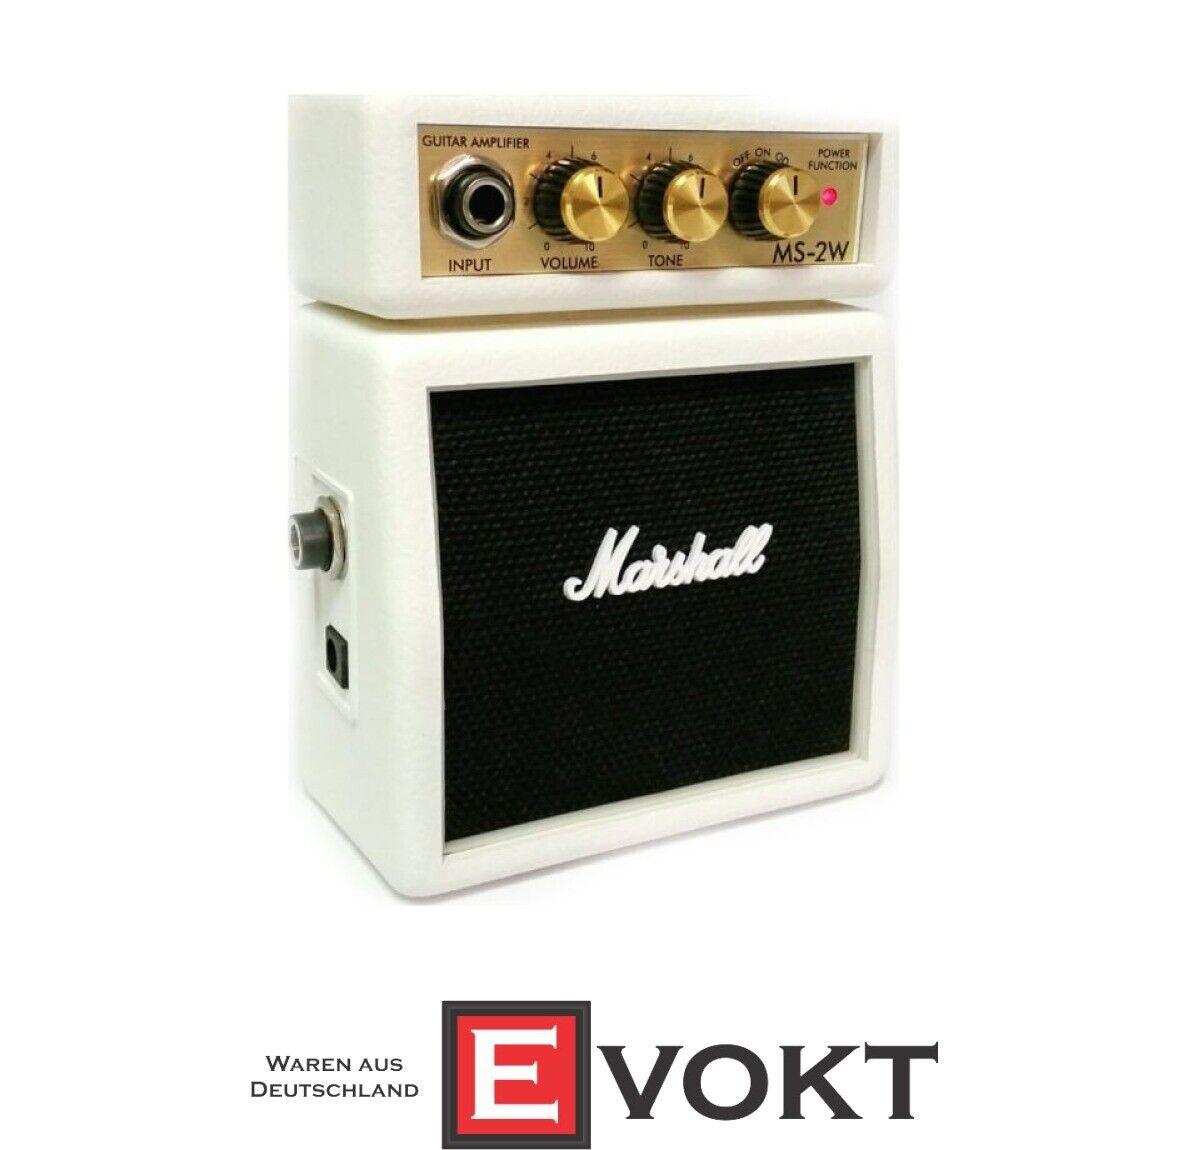 Marshall MS-2W Weiß Mini-amp Microbe Guitar Verstärker Perfektes Geschenk